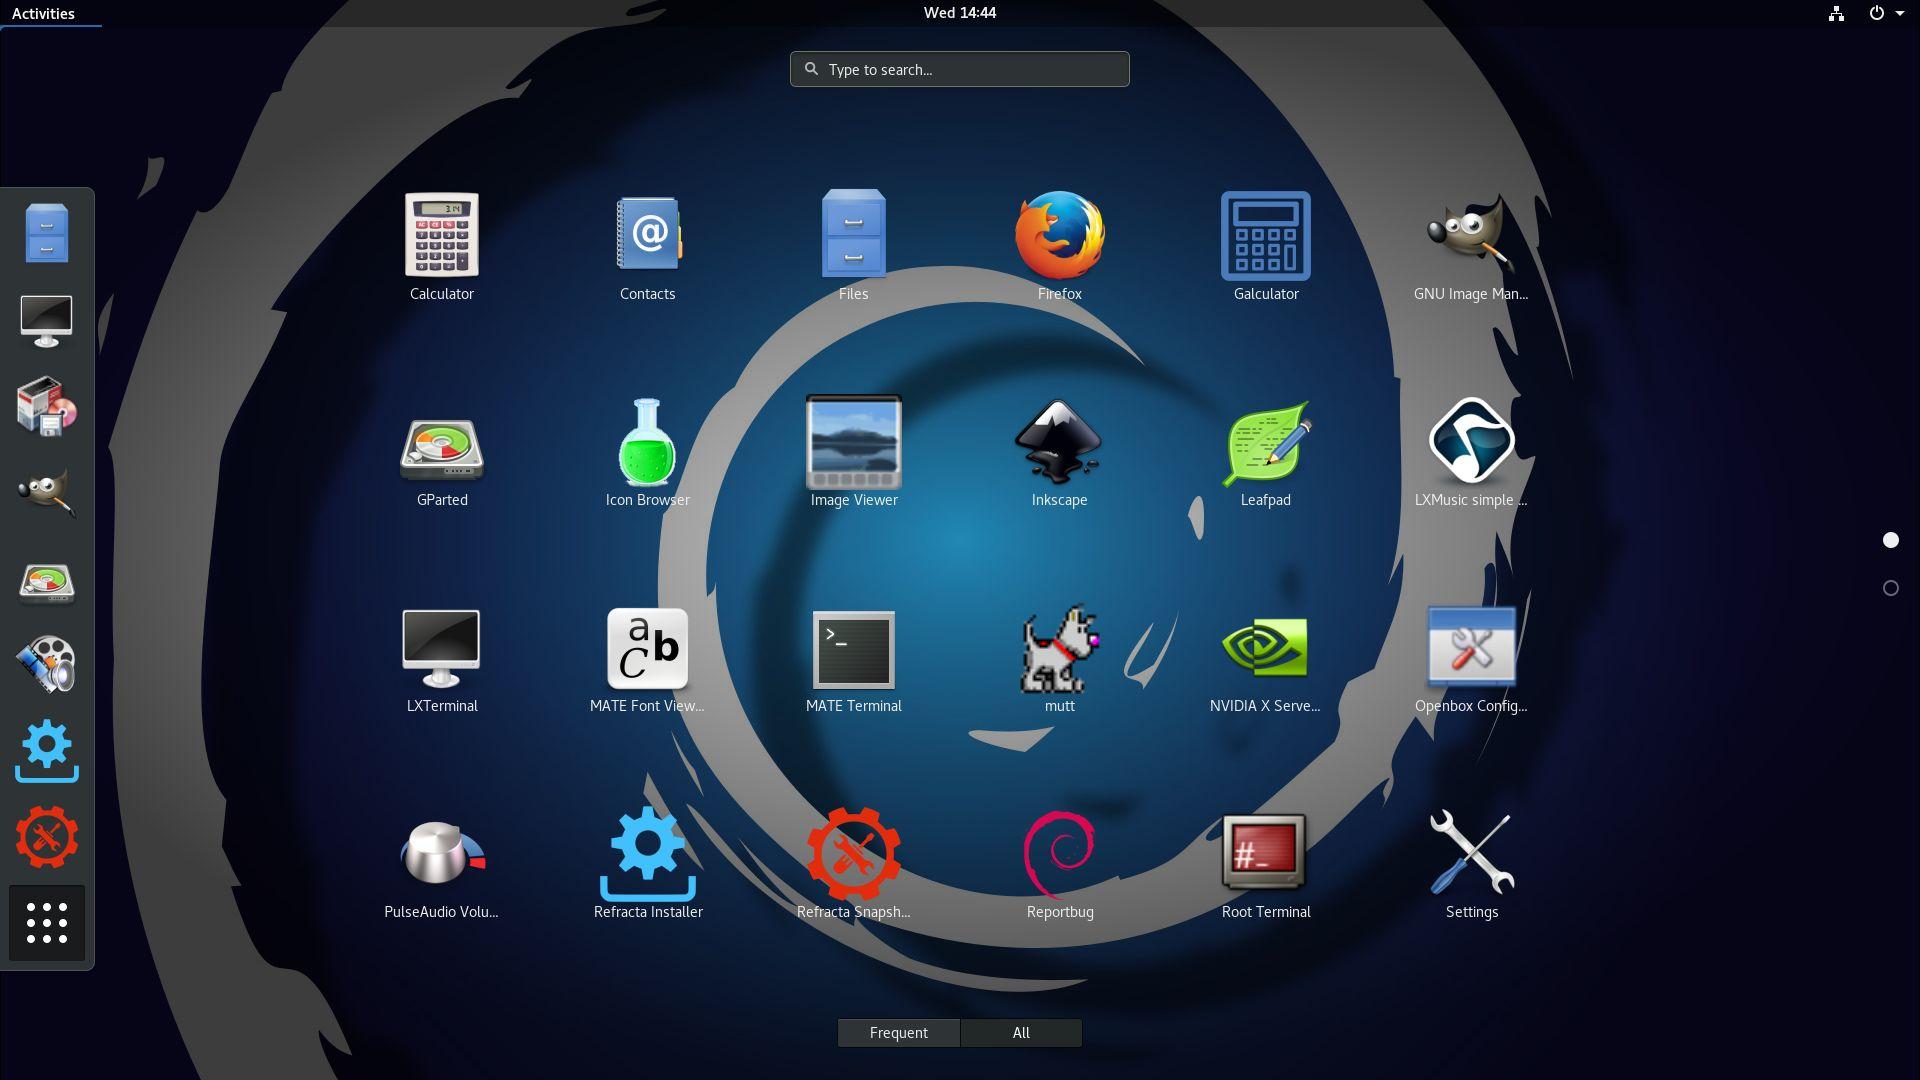 DebEX Gnome (Debian Buster/Sid) – Build 171026 – with Gnome